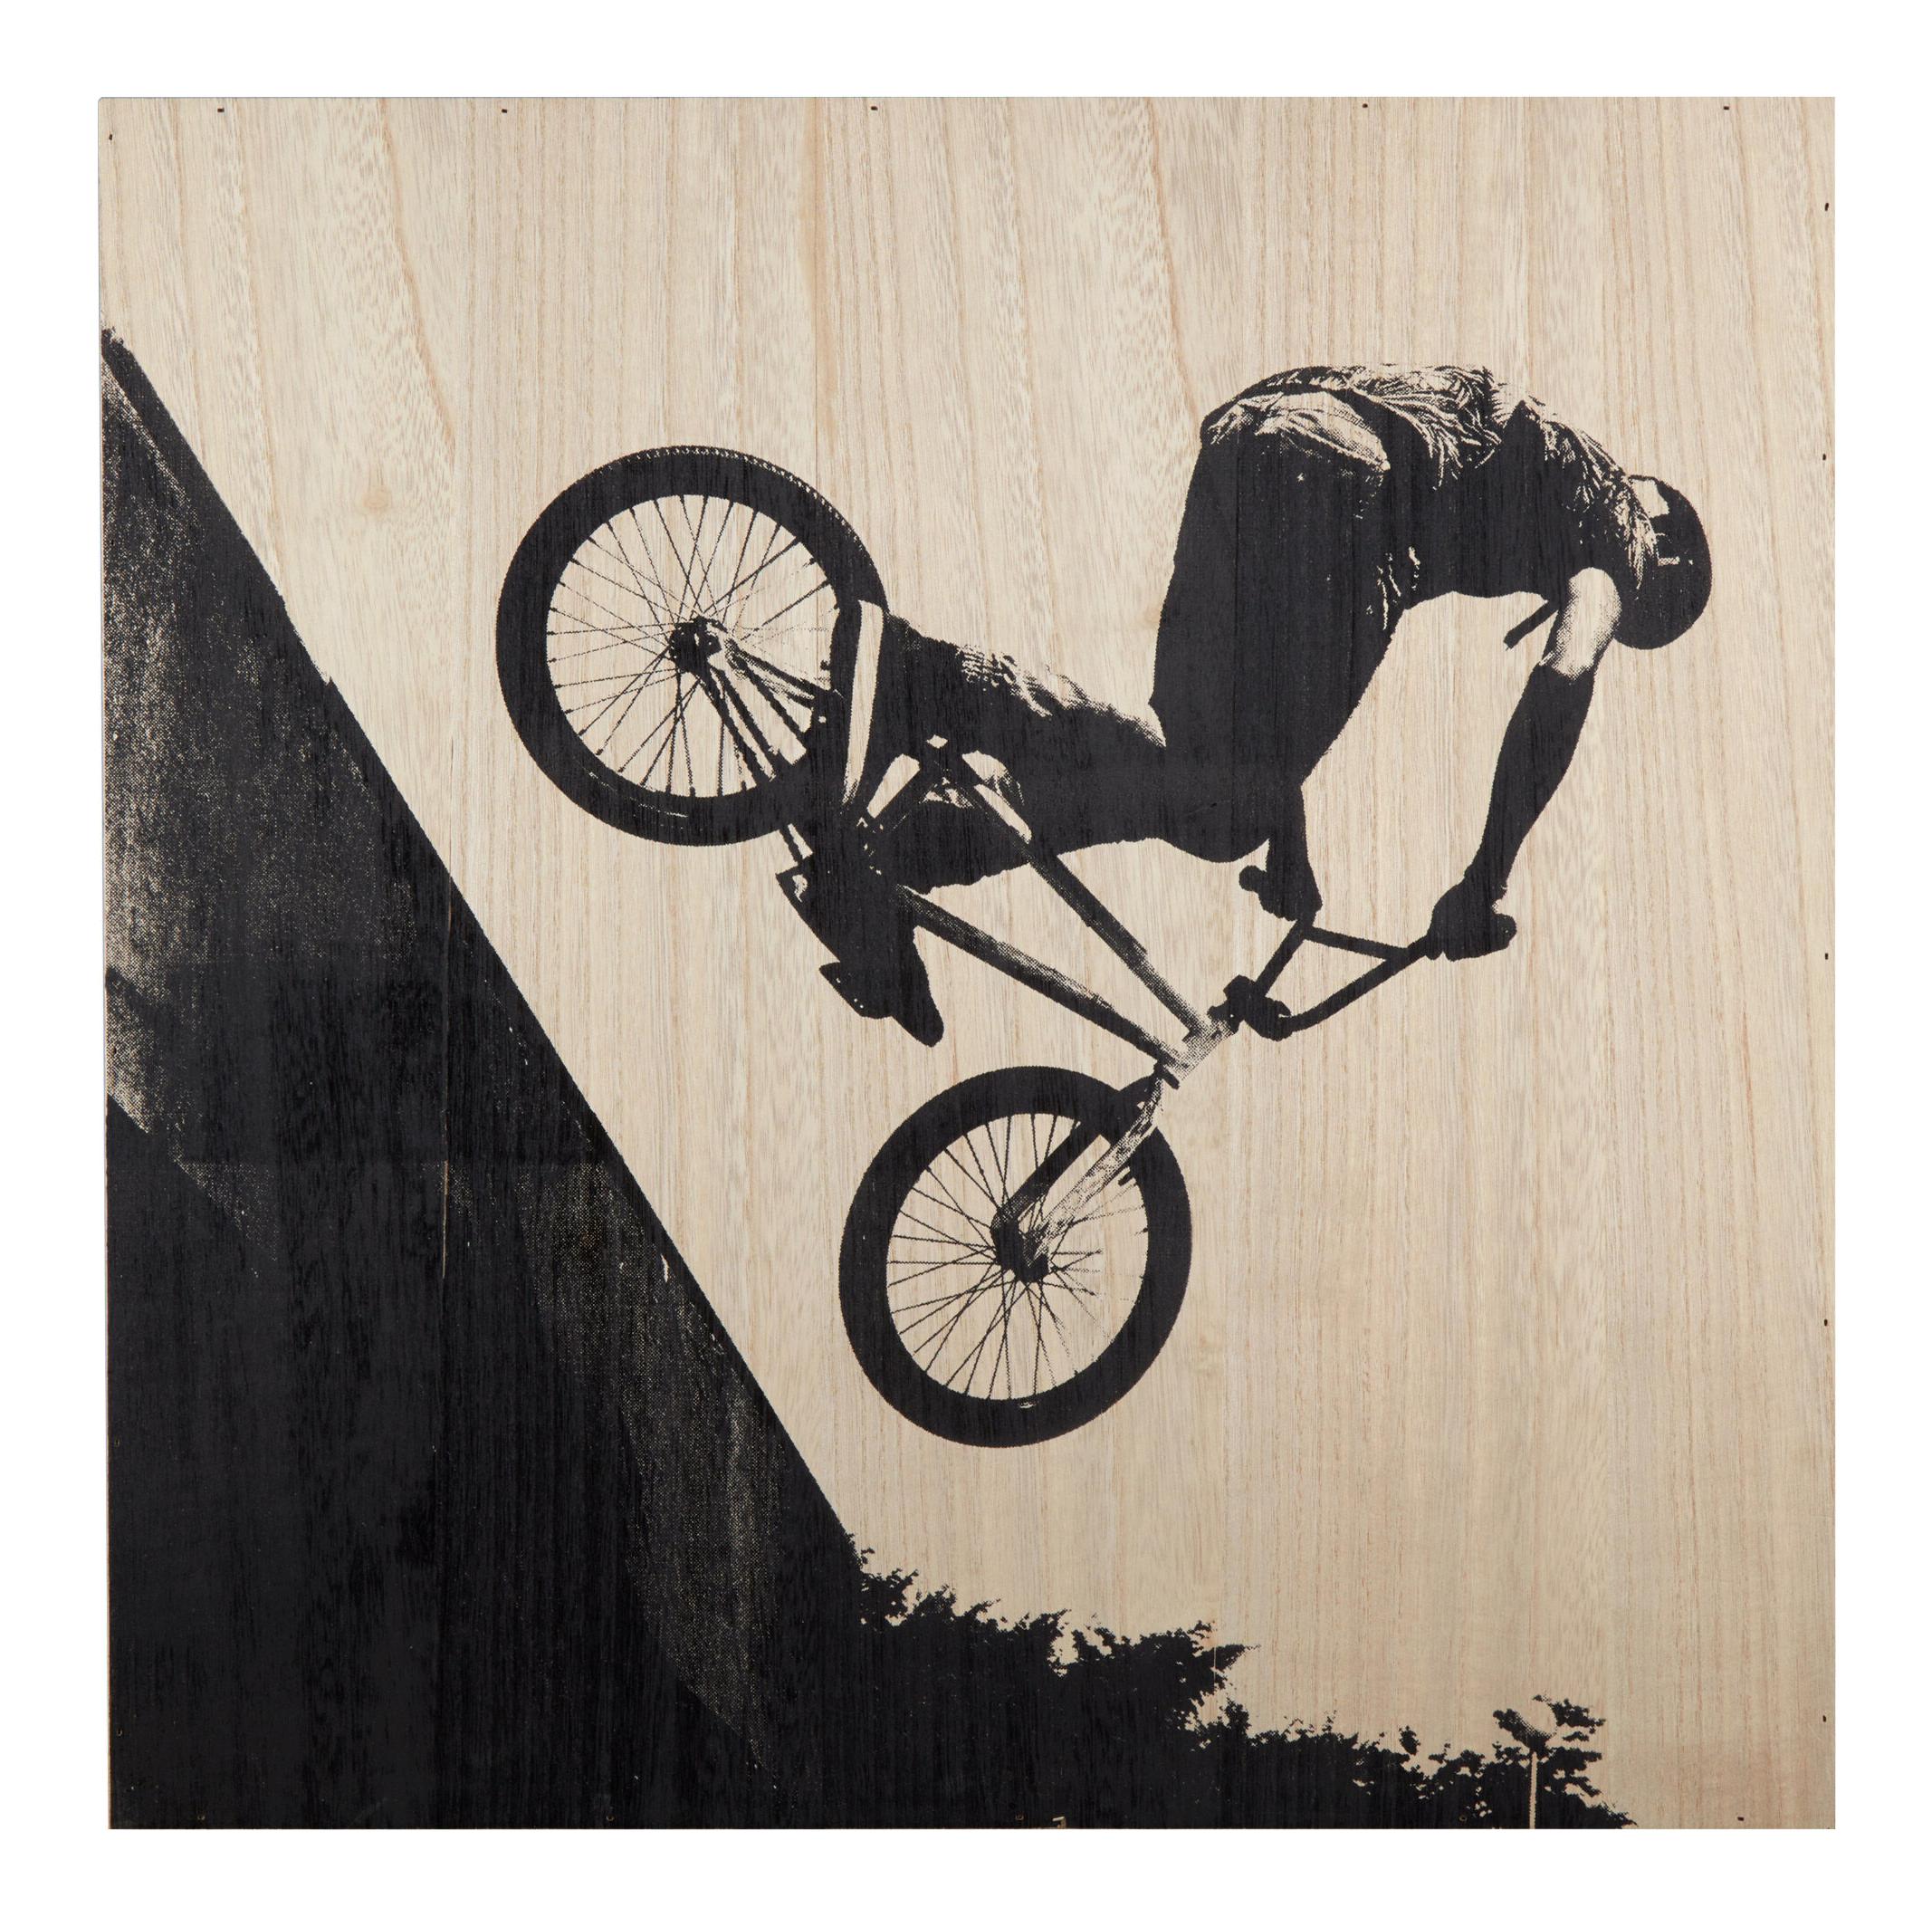 BMX Wooded Artwork